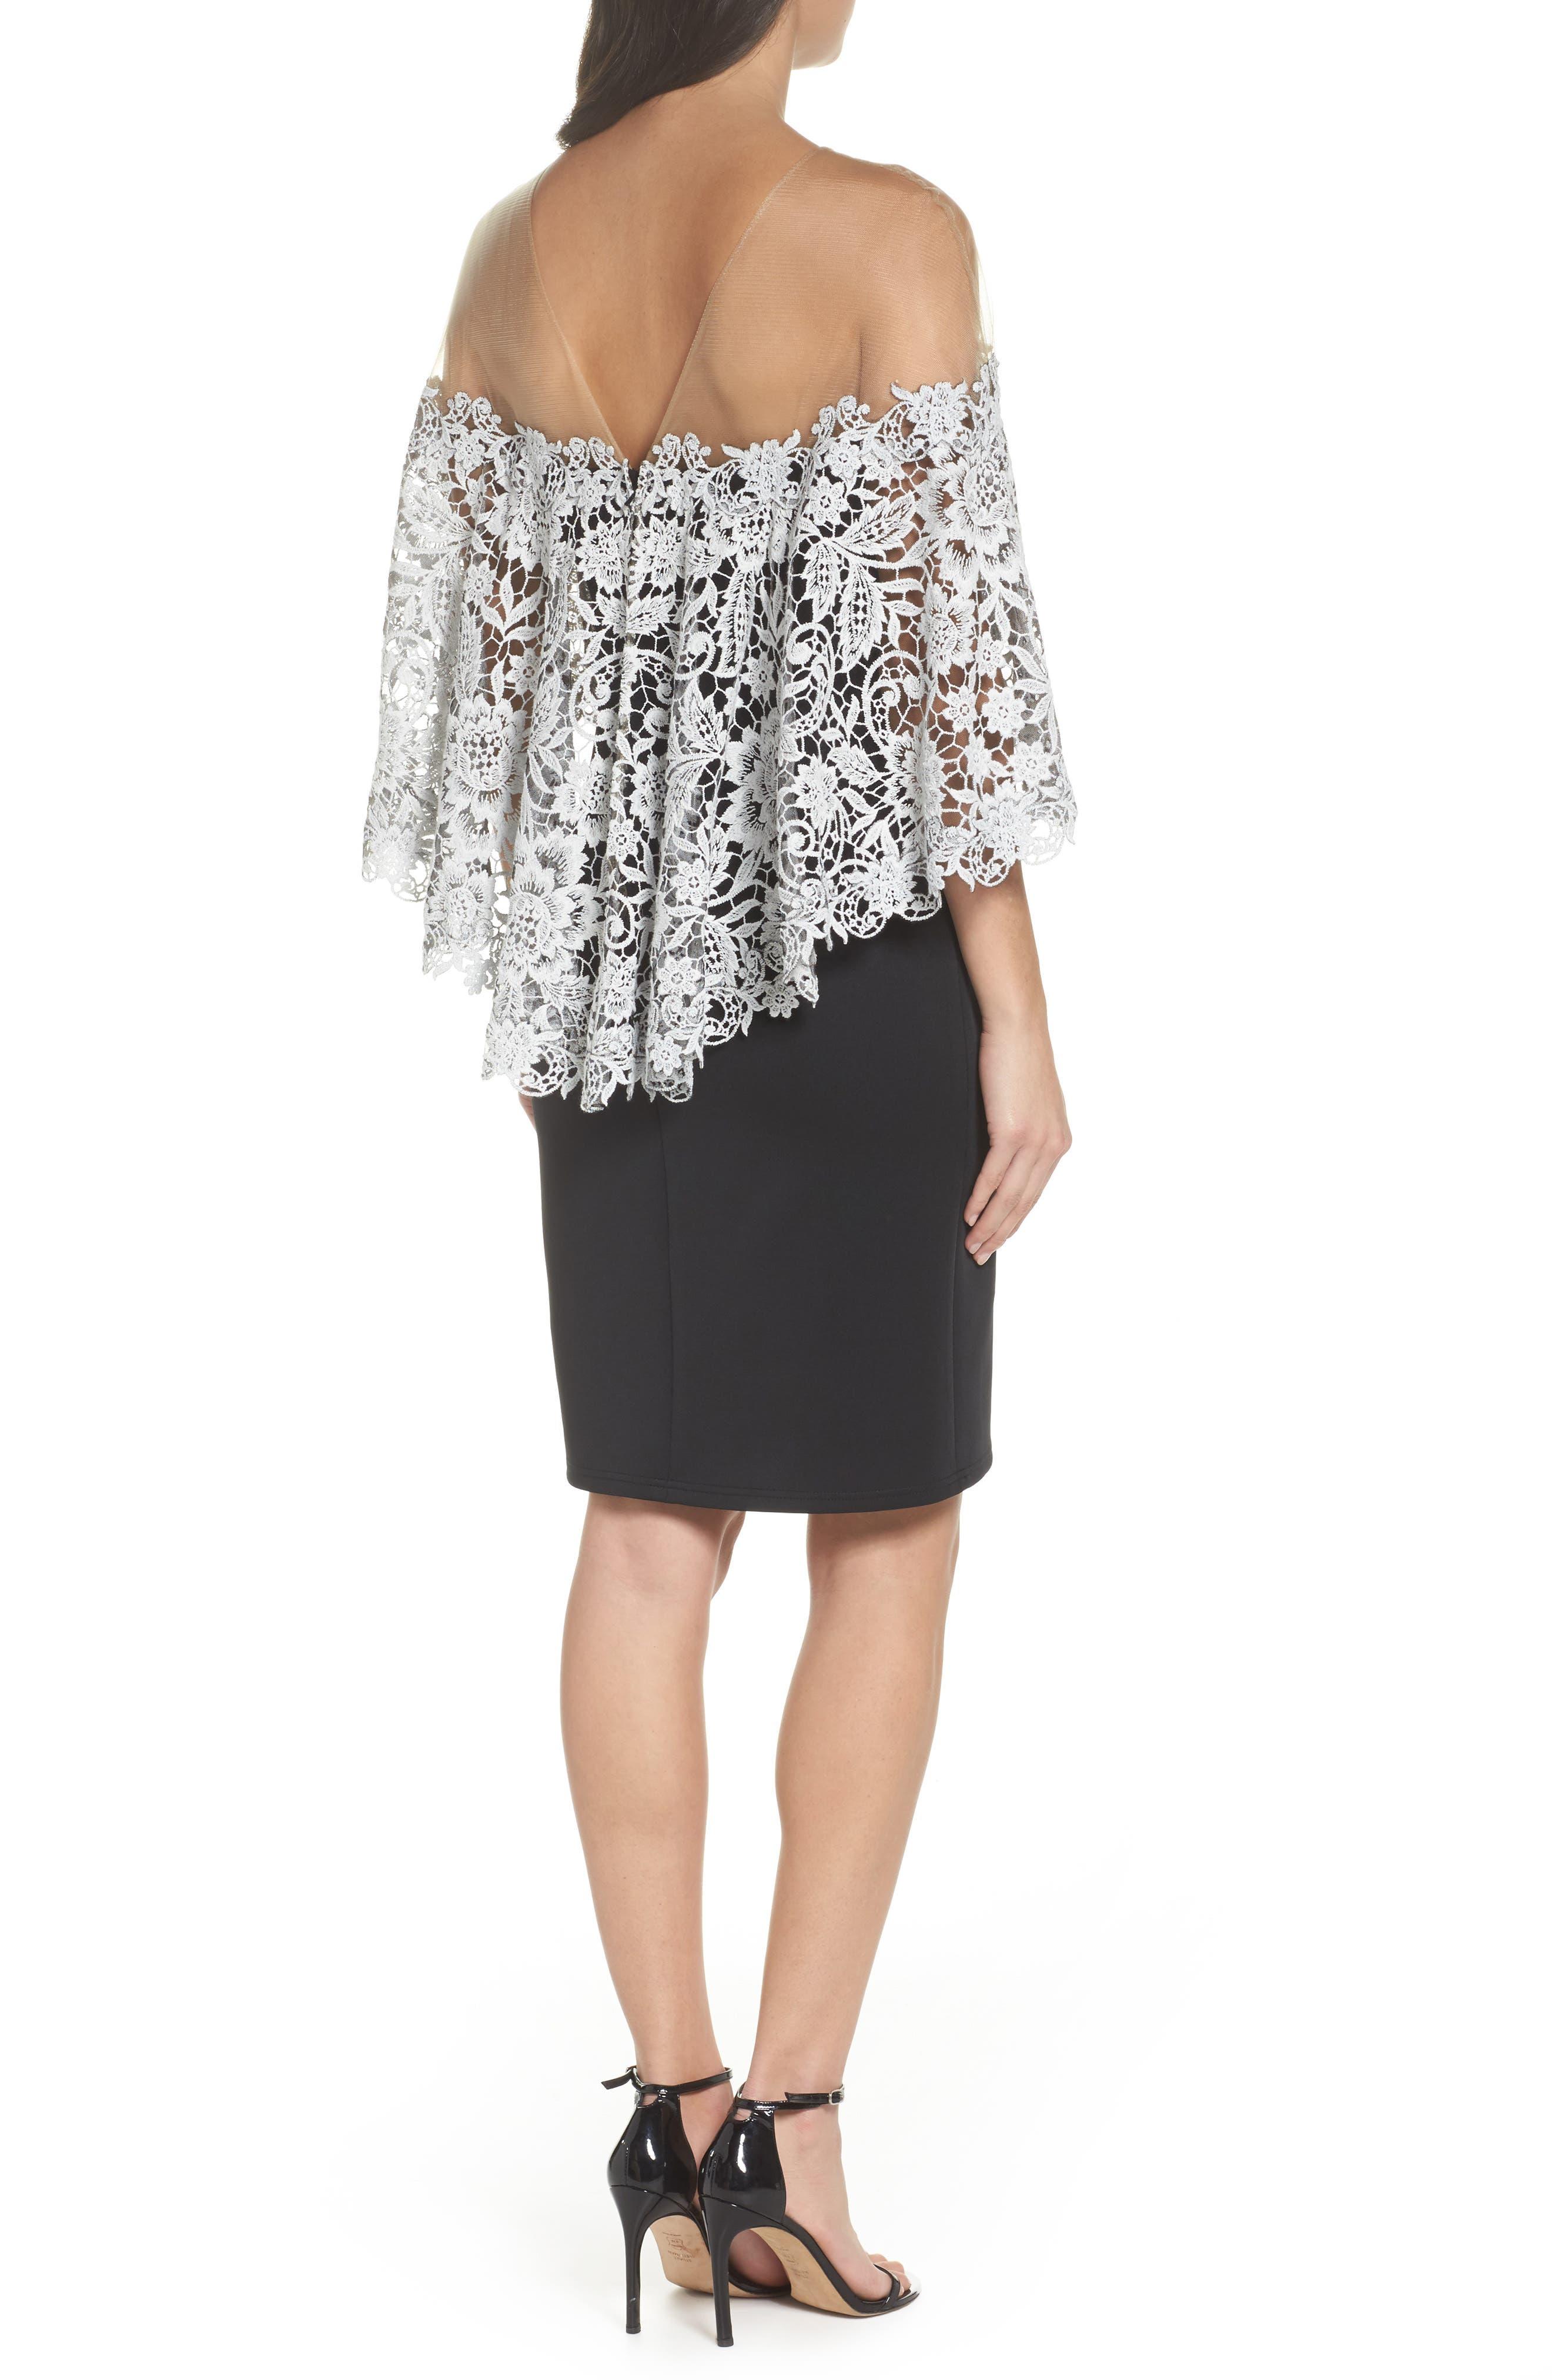 Illusion Neck Cape Dress,                             Alternate thumbnail 2, color,                             Black/ Ivory